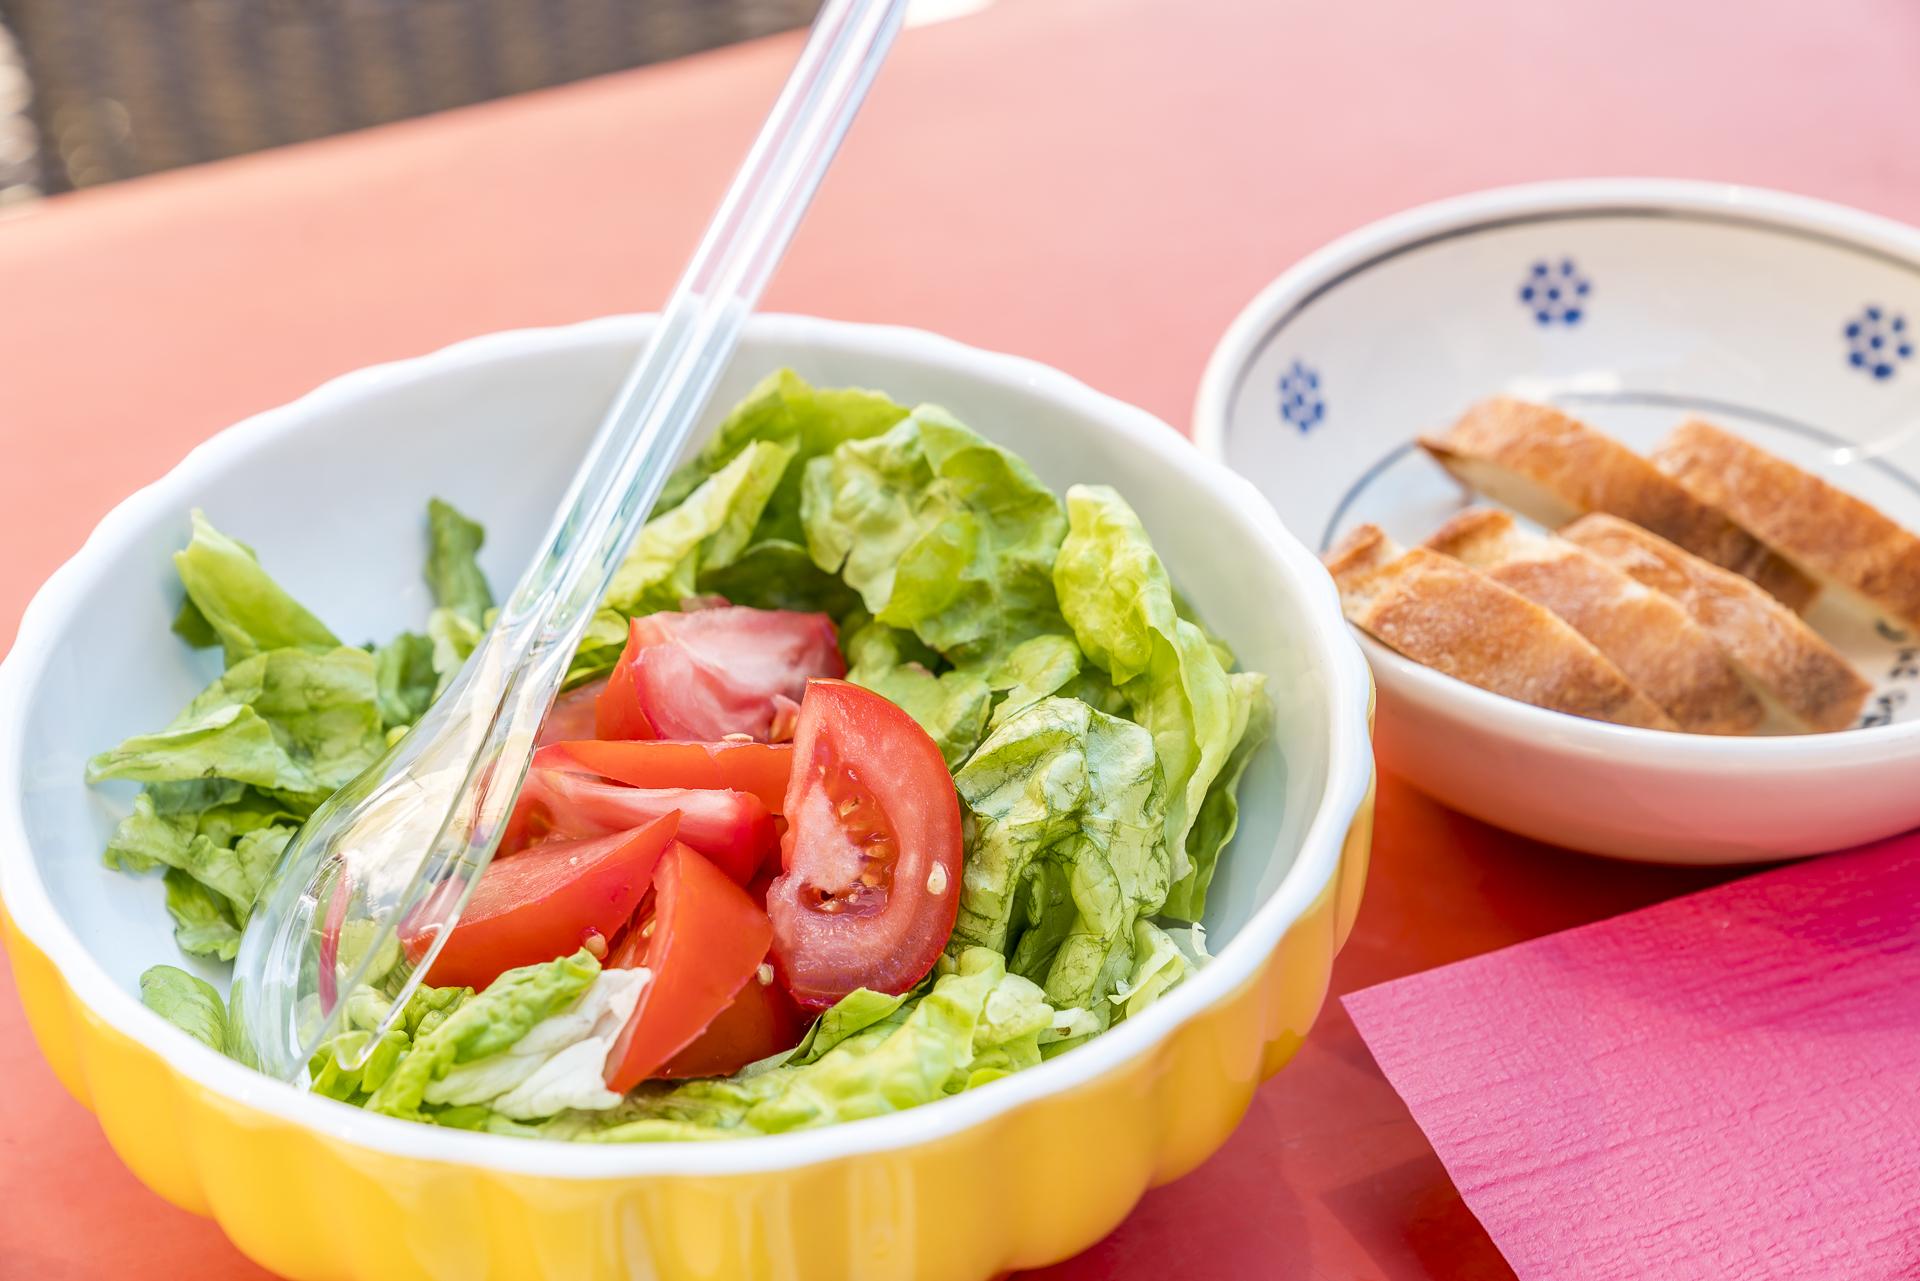 Salatschüssel in der Osteria Landarenca